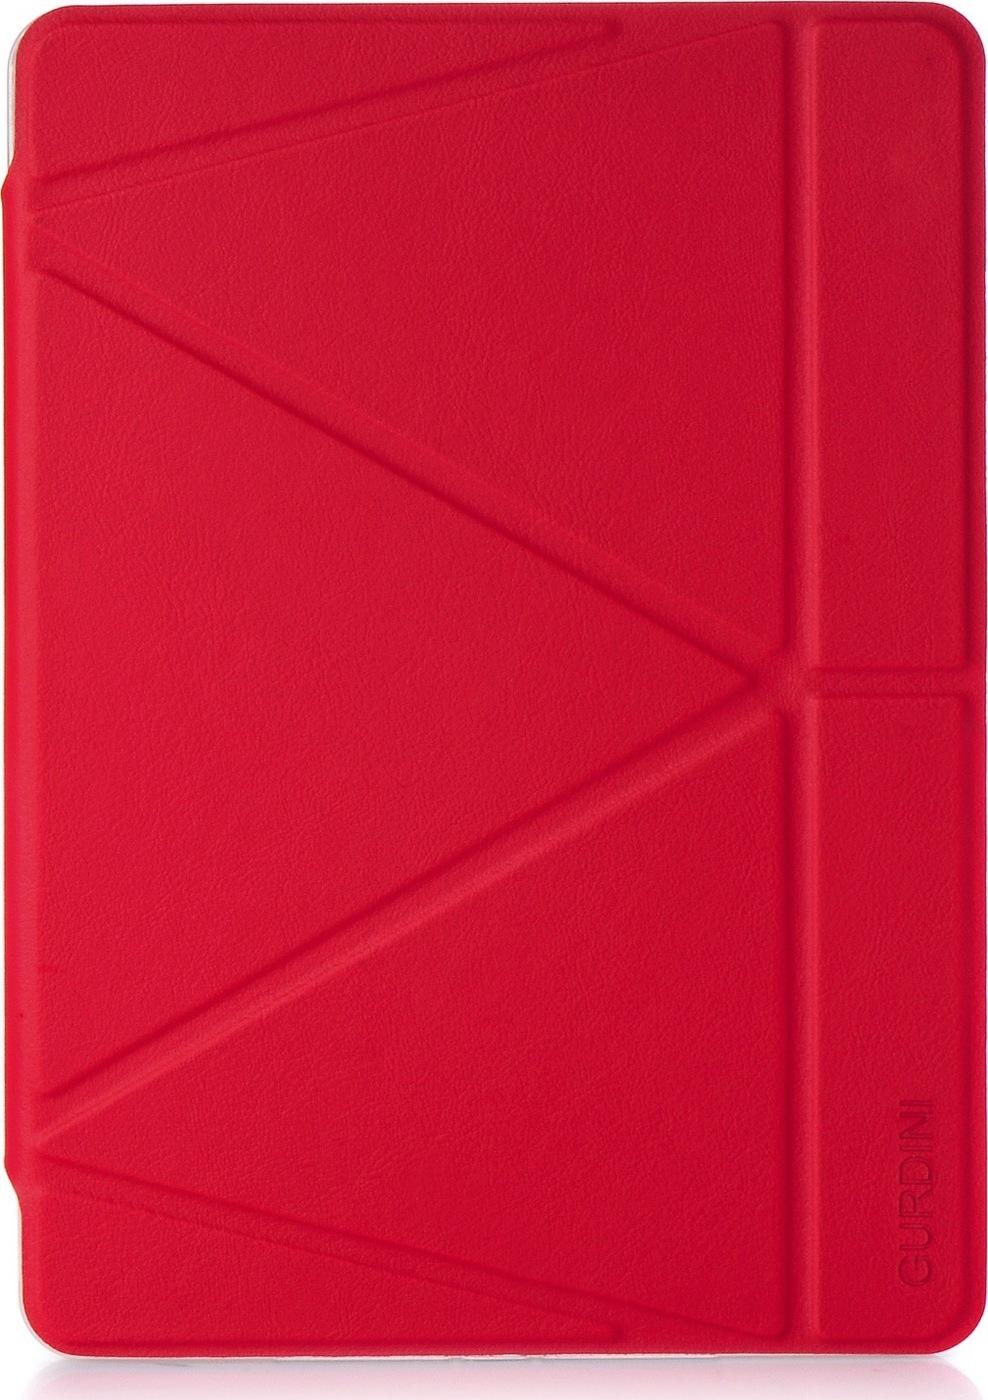 Чехол книжка Gurdini Lights Series 908402 для Apple iPad Pro 11,908402, красный